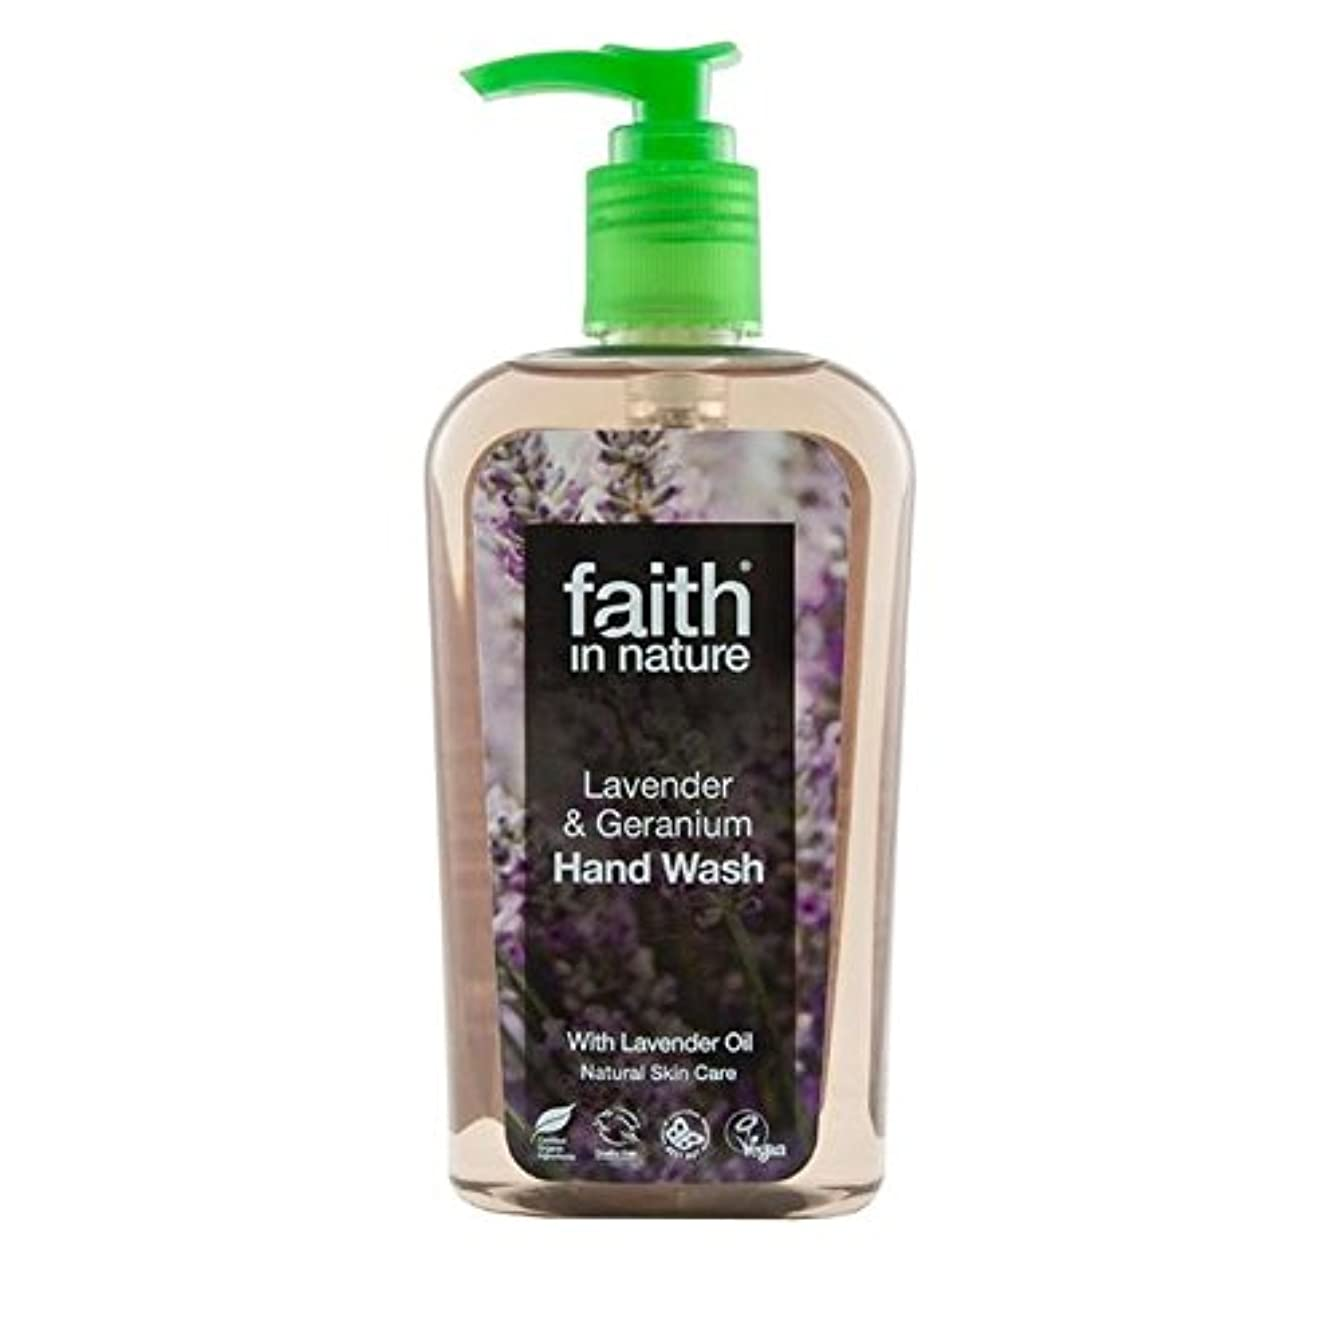 Faith in Nature Lavender & Geranium Handwash 300ml - (Faith In Nature) 自然ラベンダー&ゼラニウム手洗いの300ミリリットルの信仰 [並行輸入品]